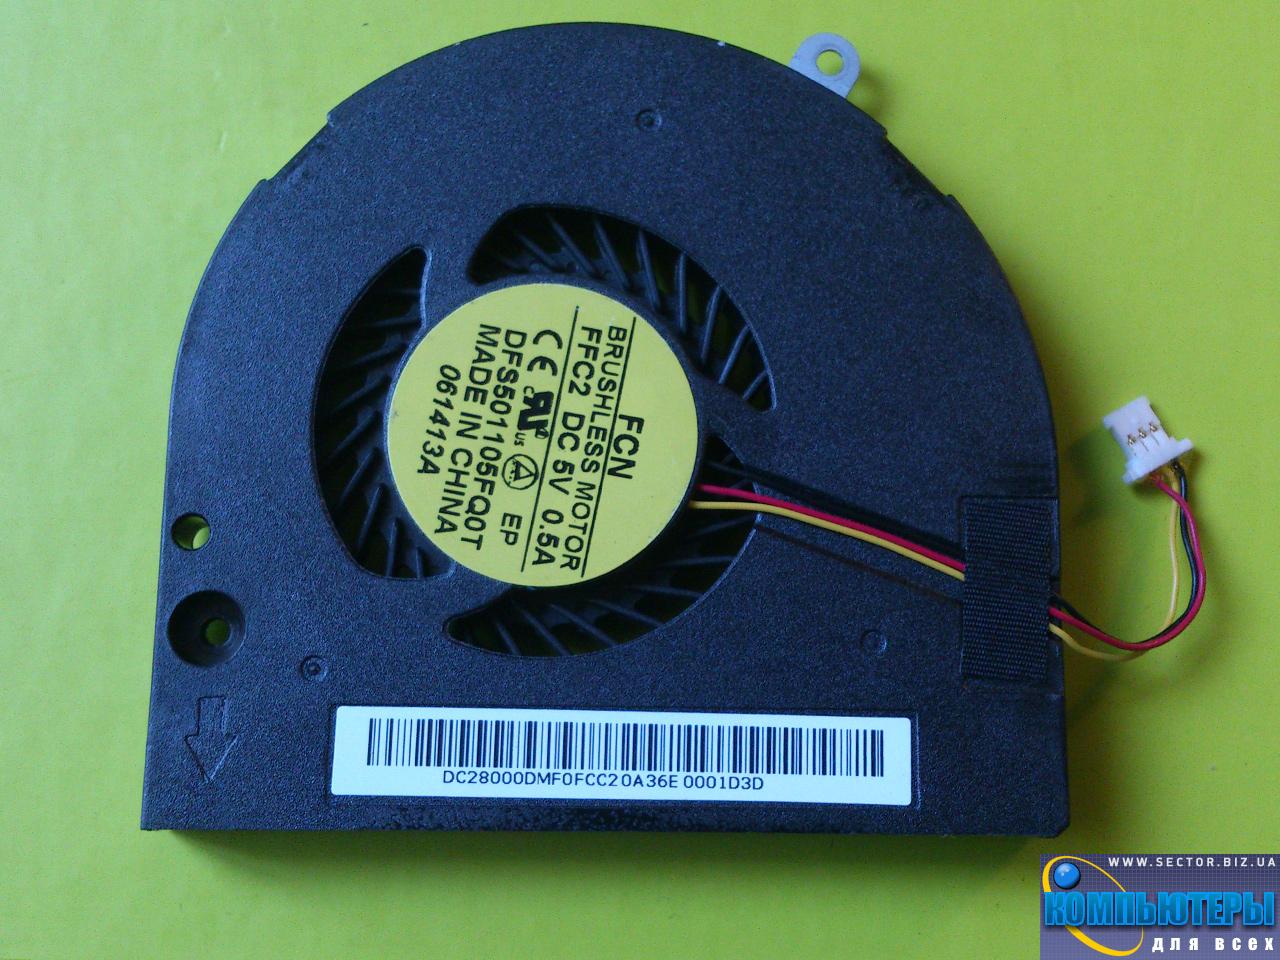 Кулер к ноутбуку Acer Aspire V5-561 V5-561G V5-561P V5-561PG p/n: DFS501105FQ0T FFC2. Фото № 3.